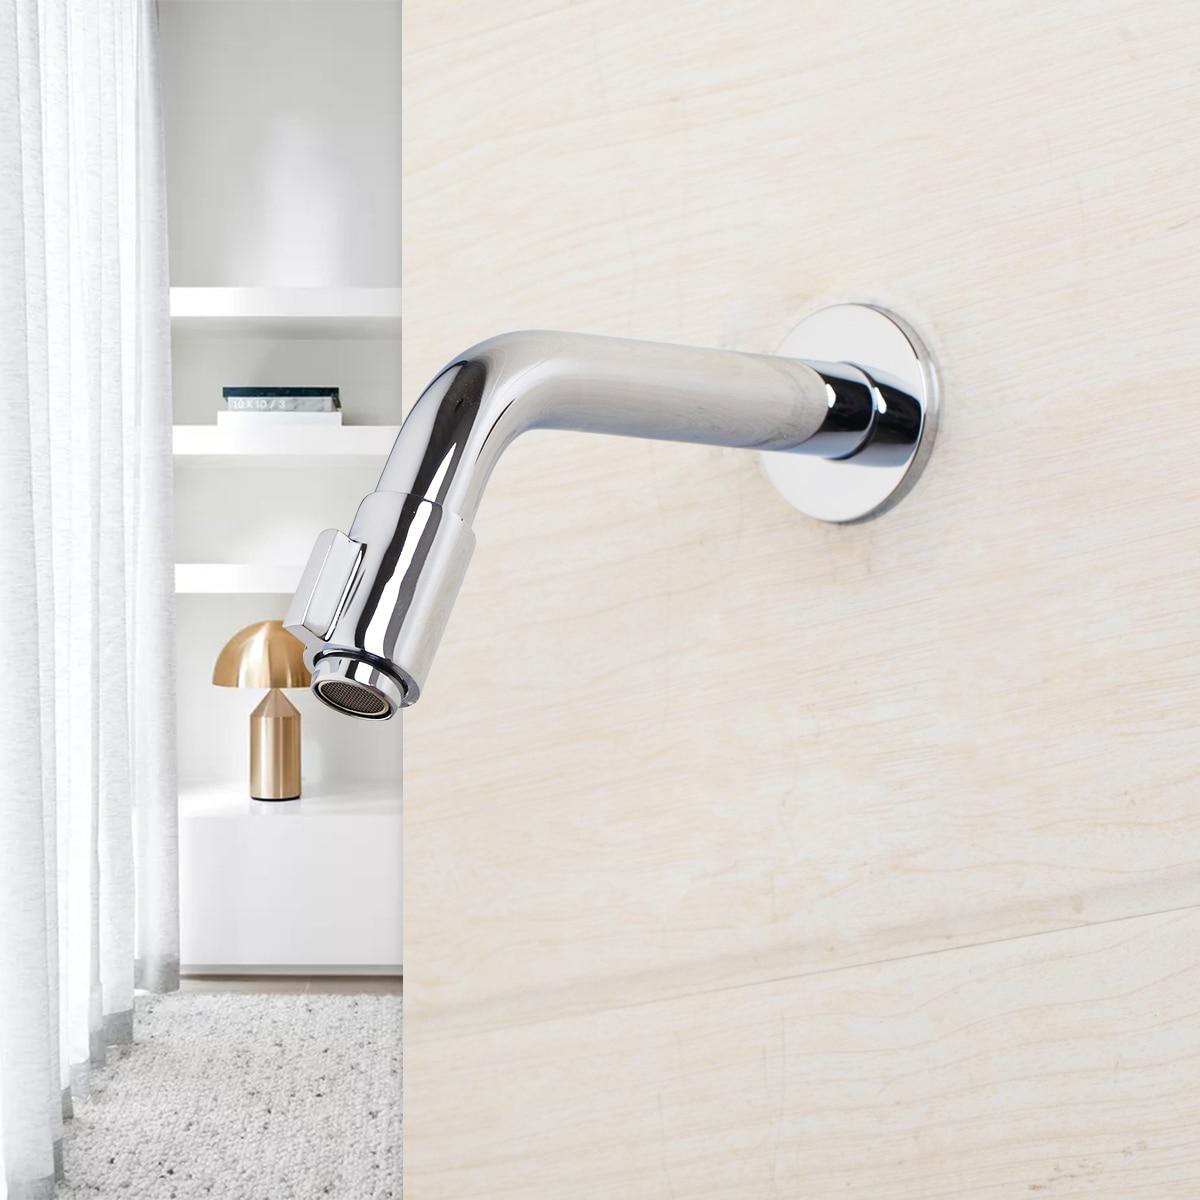 2019 Spout Contrl Bathroom Garden Tap Washing Machine Faucet Wall throughout sizing 1200 X 1200